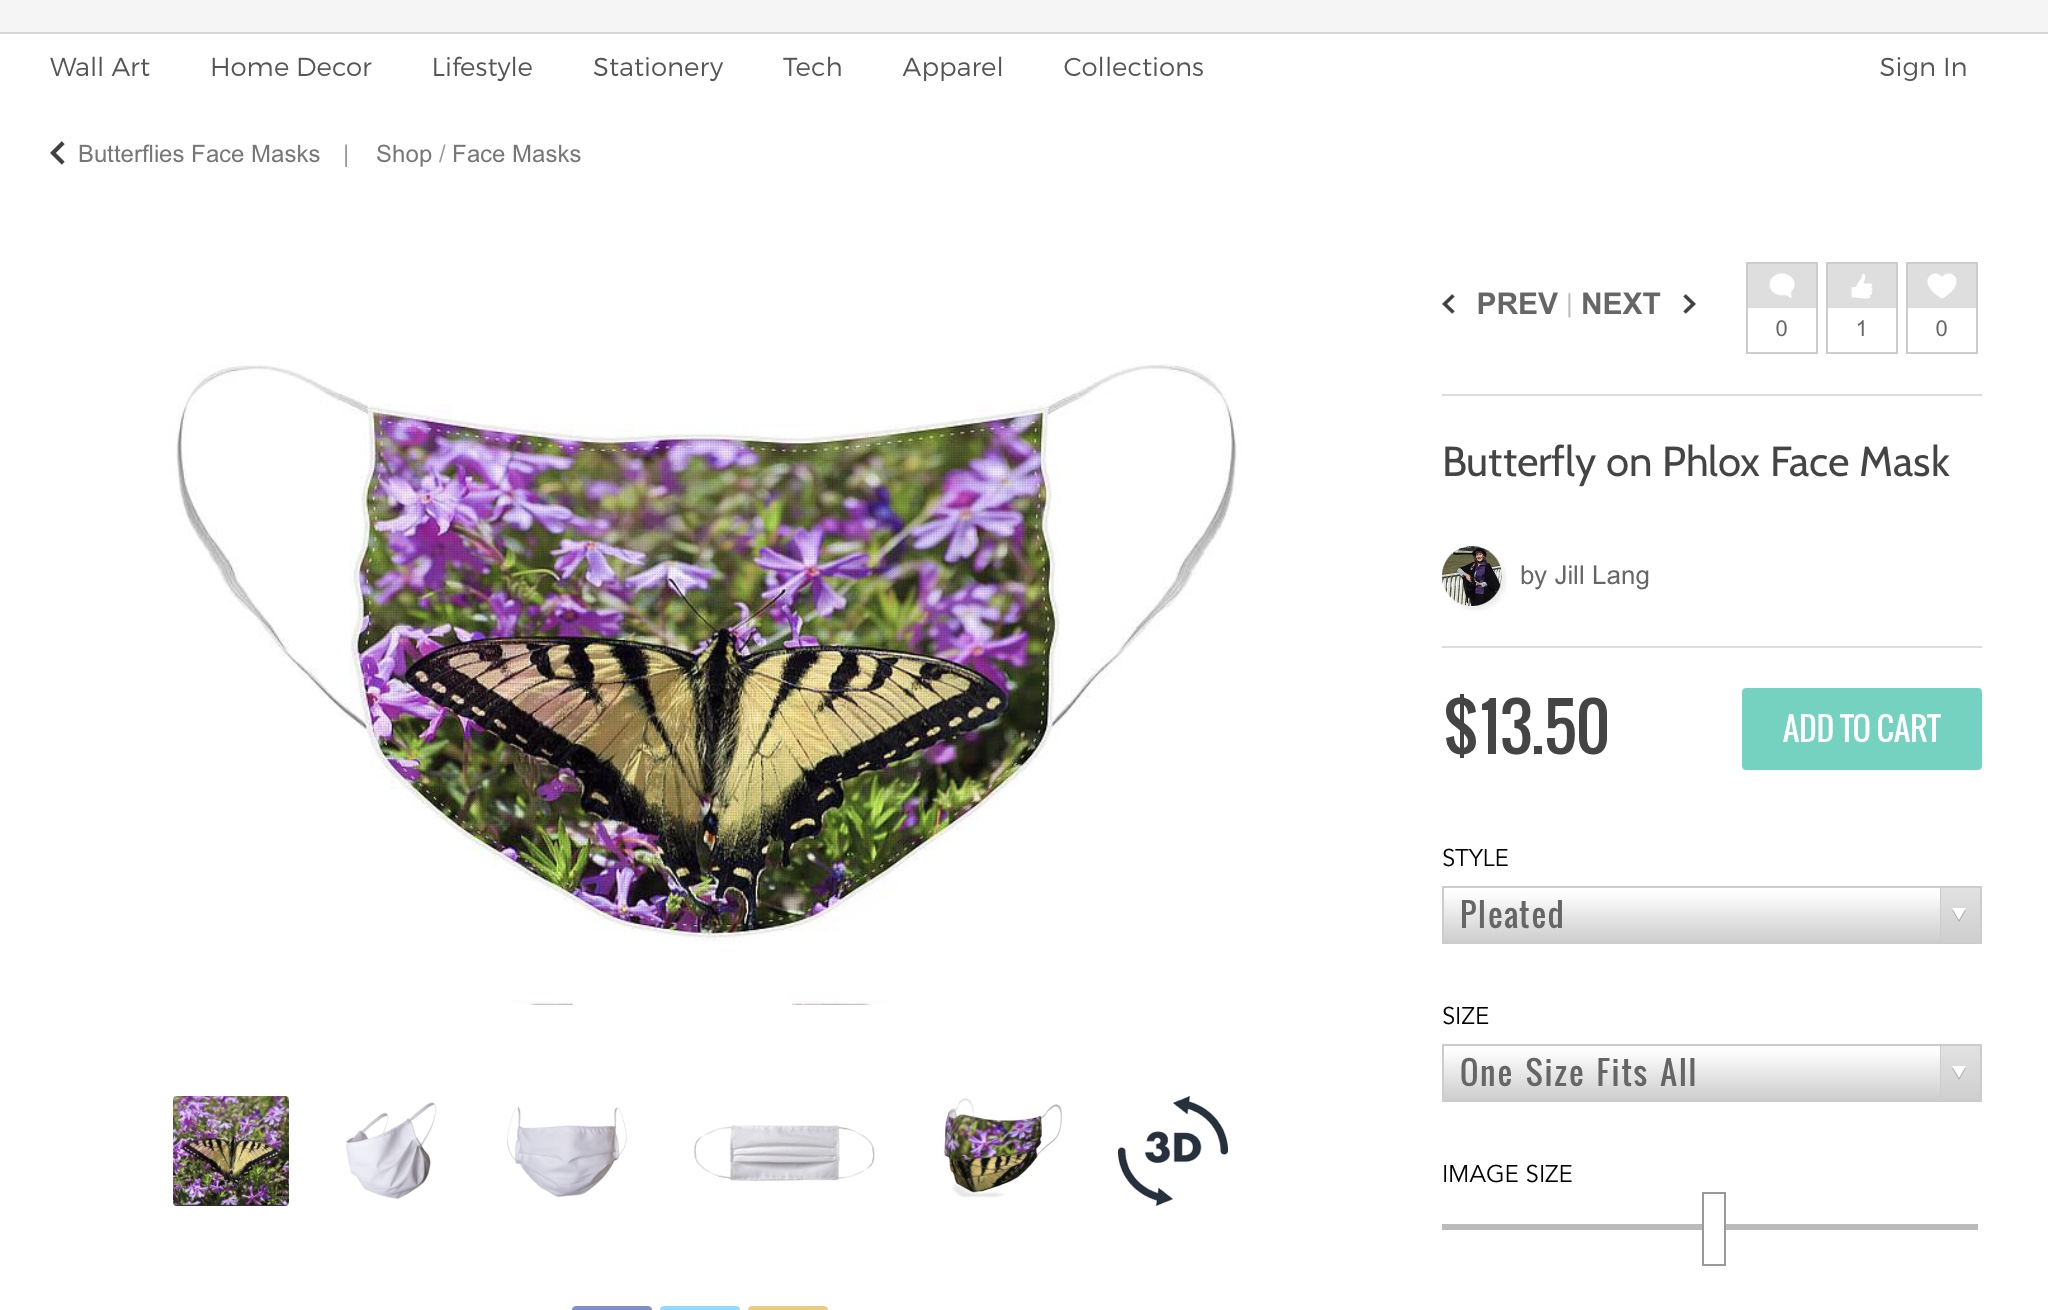 Butterfly Face Masks